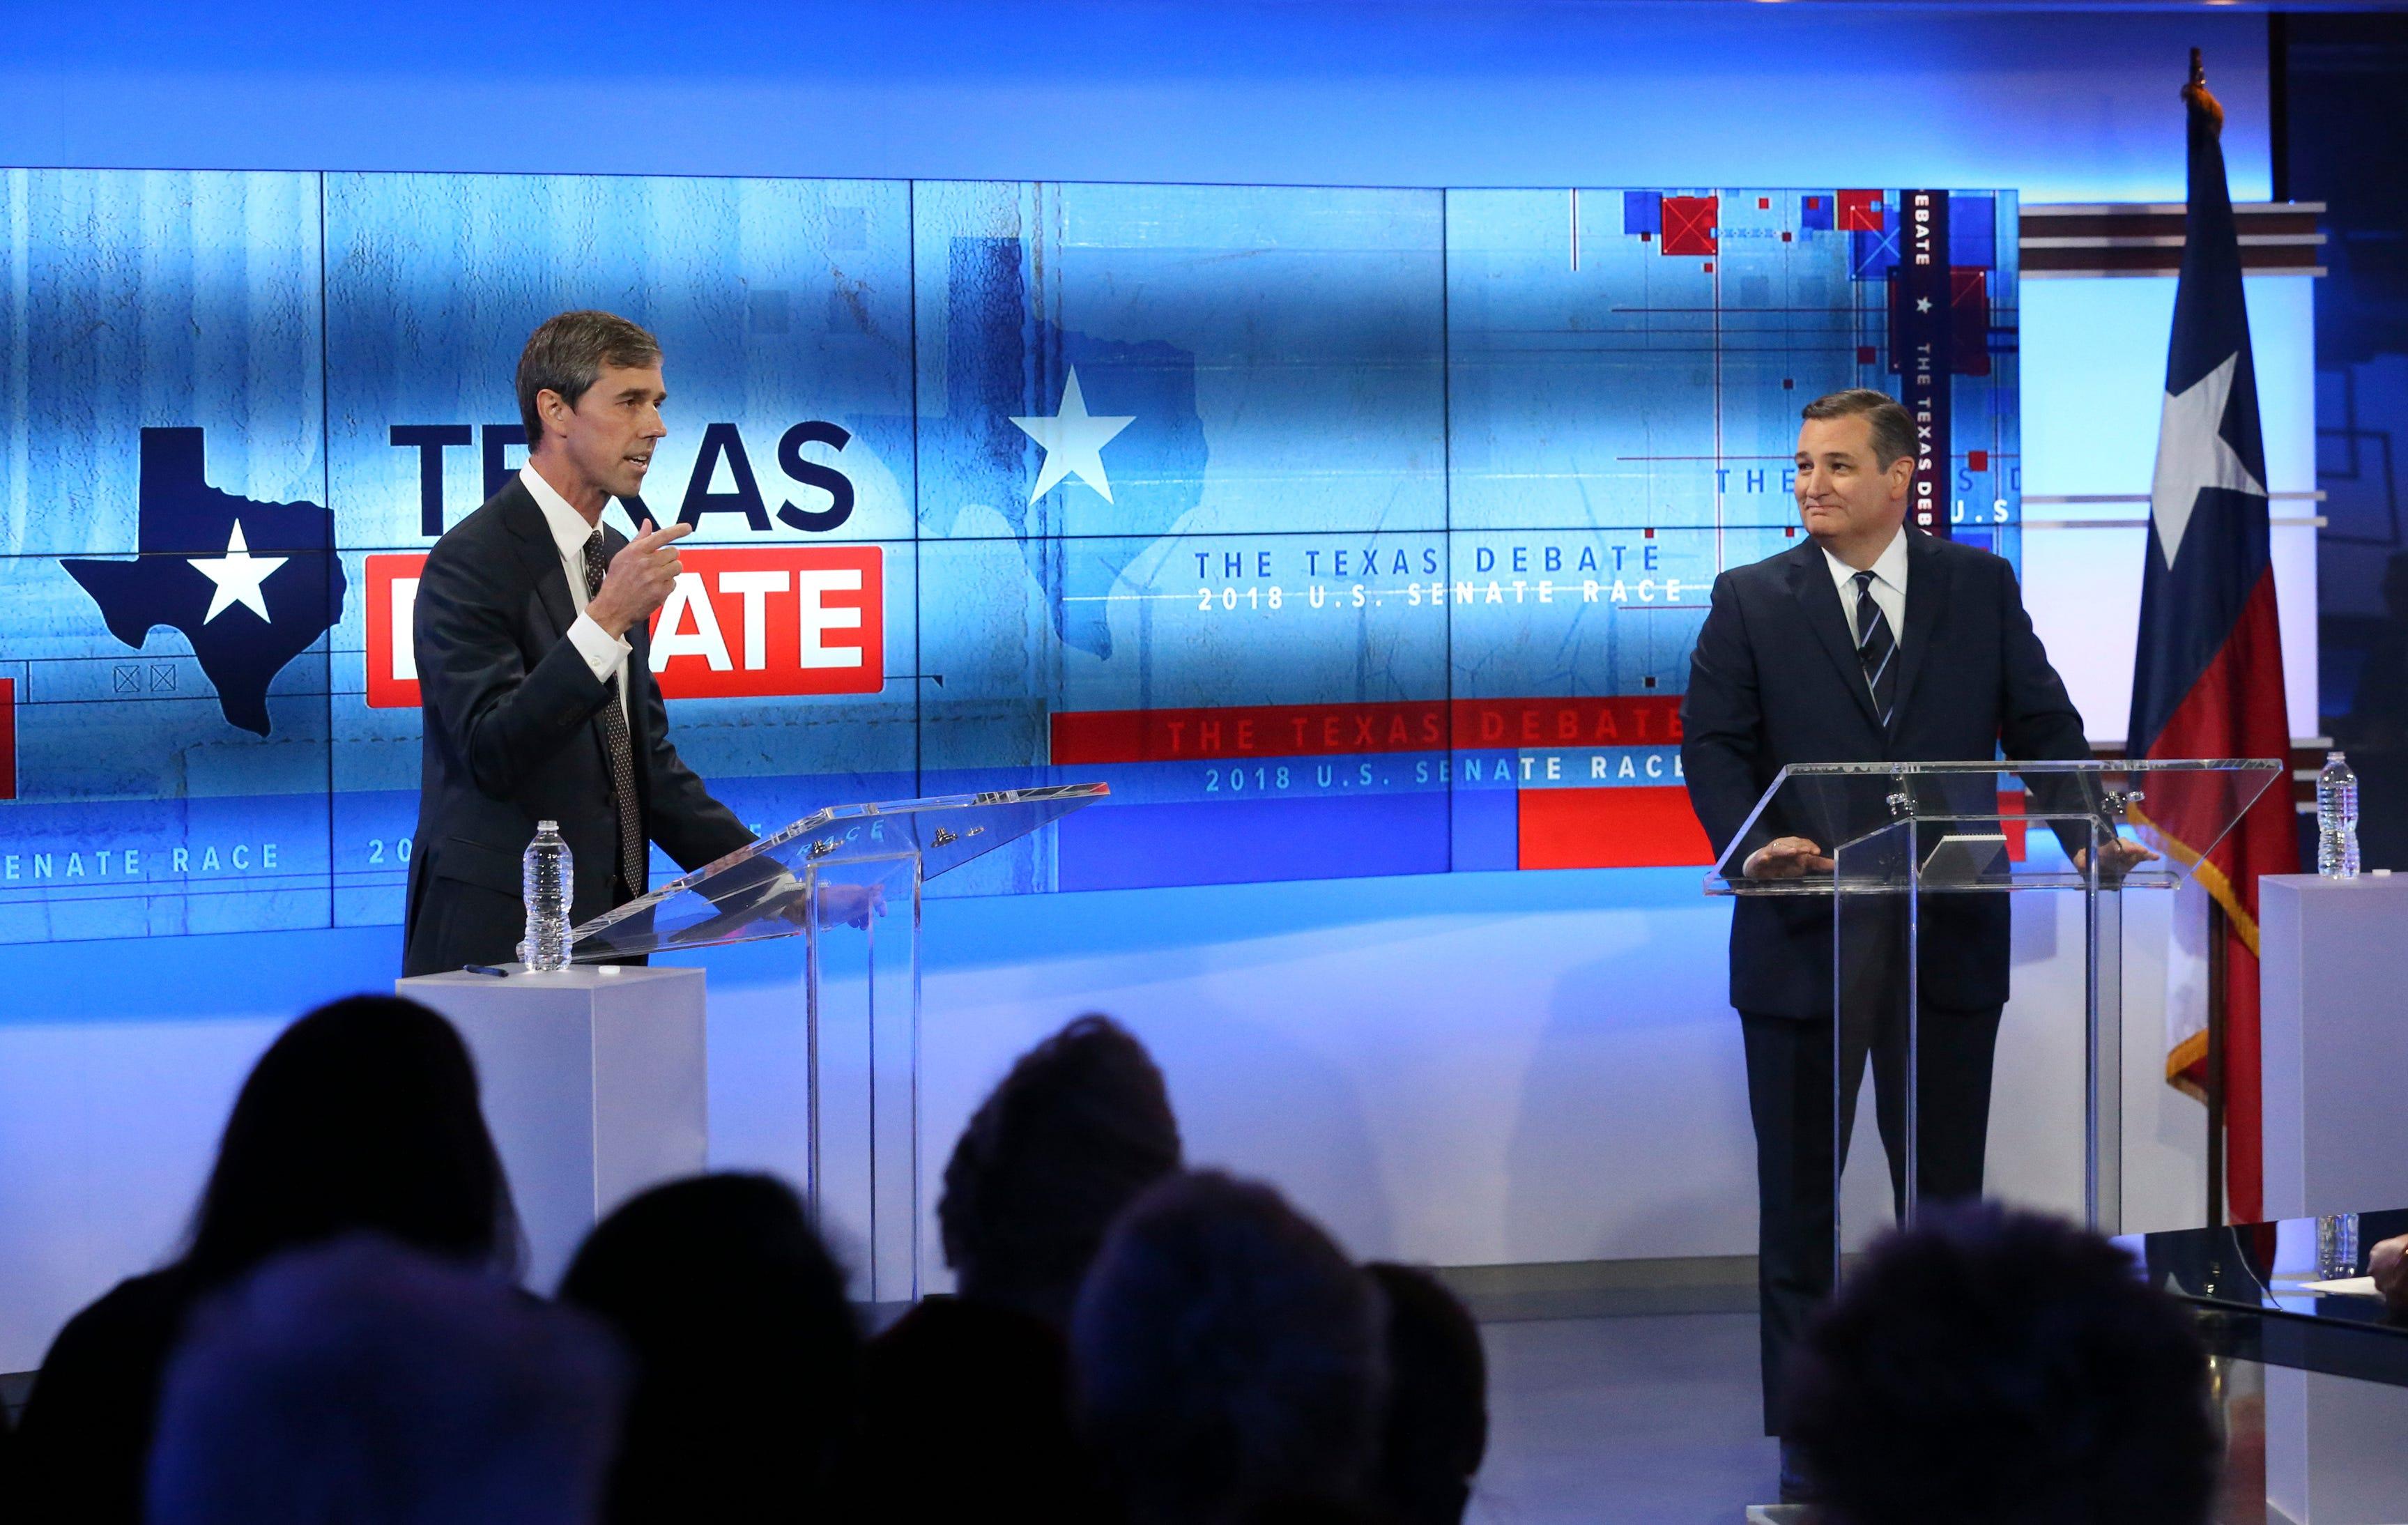 Cruz-Beto debate: Who won the final Texas debate between Ted Cruz and Beto O'Rourke? | El Paso Times